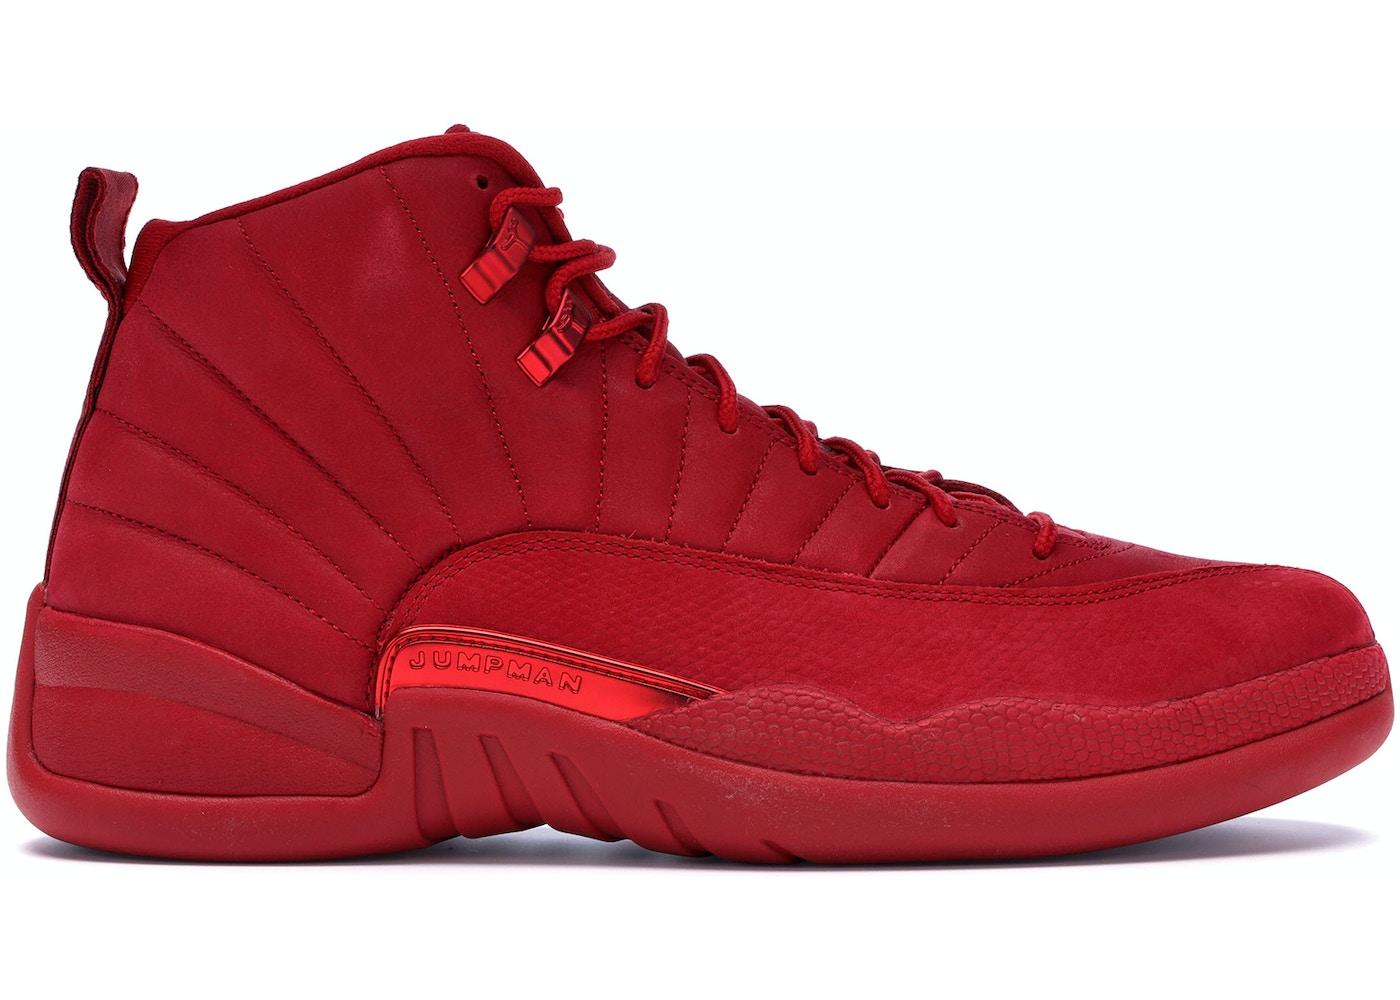 5c021a62f71b Jordan 12 Retro Gym Red (2018) - 130690-601